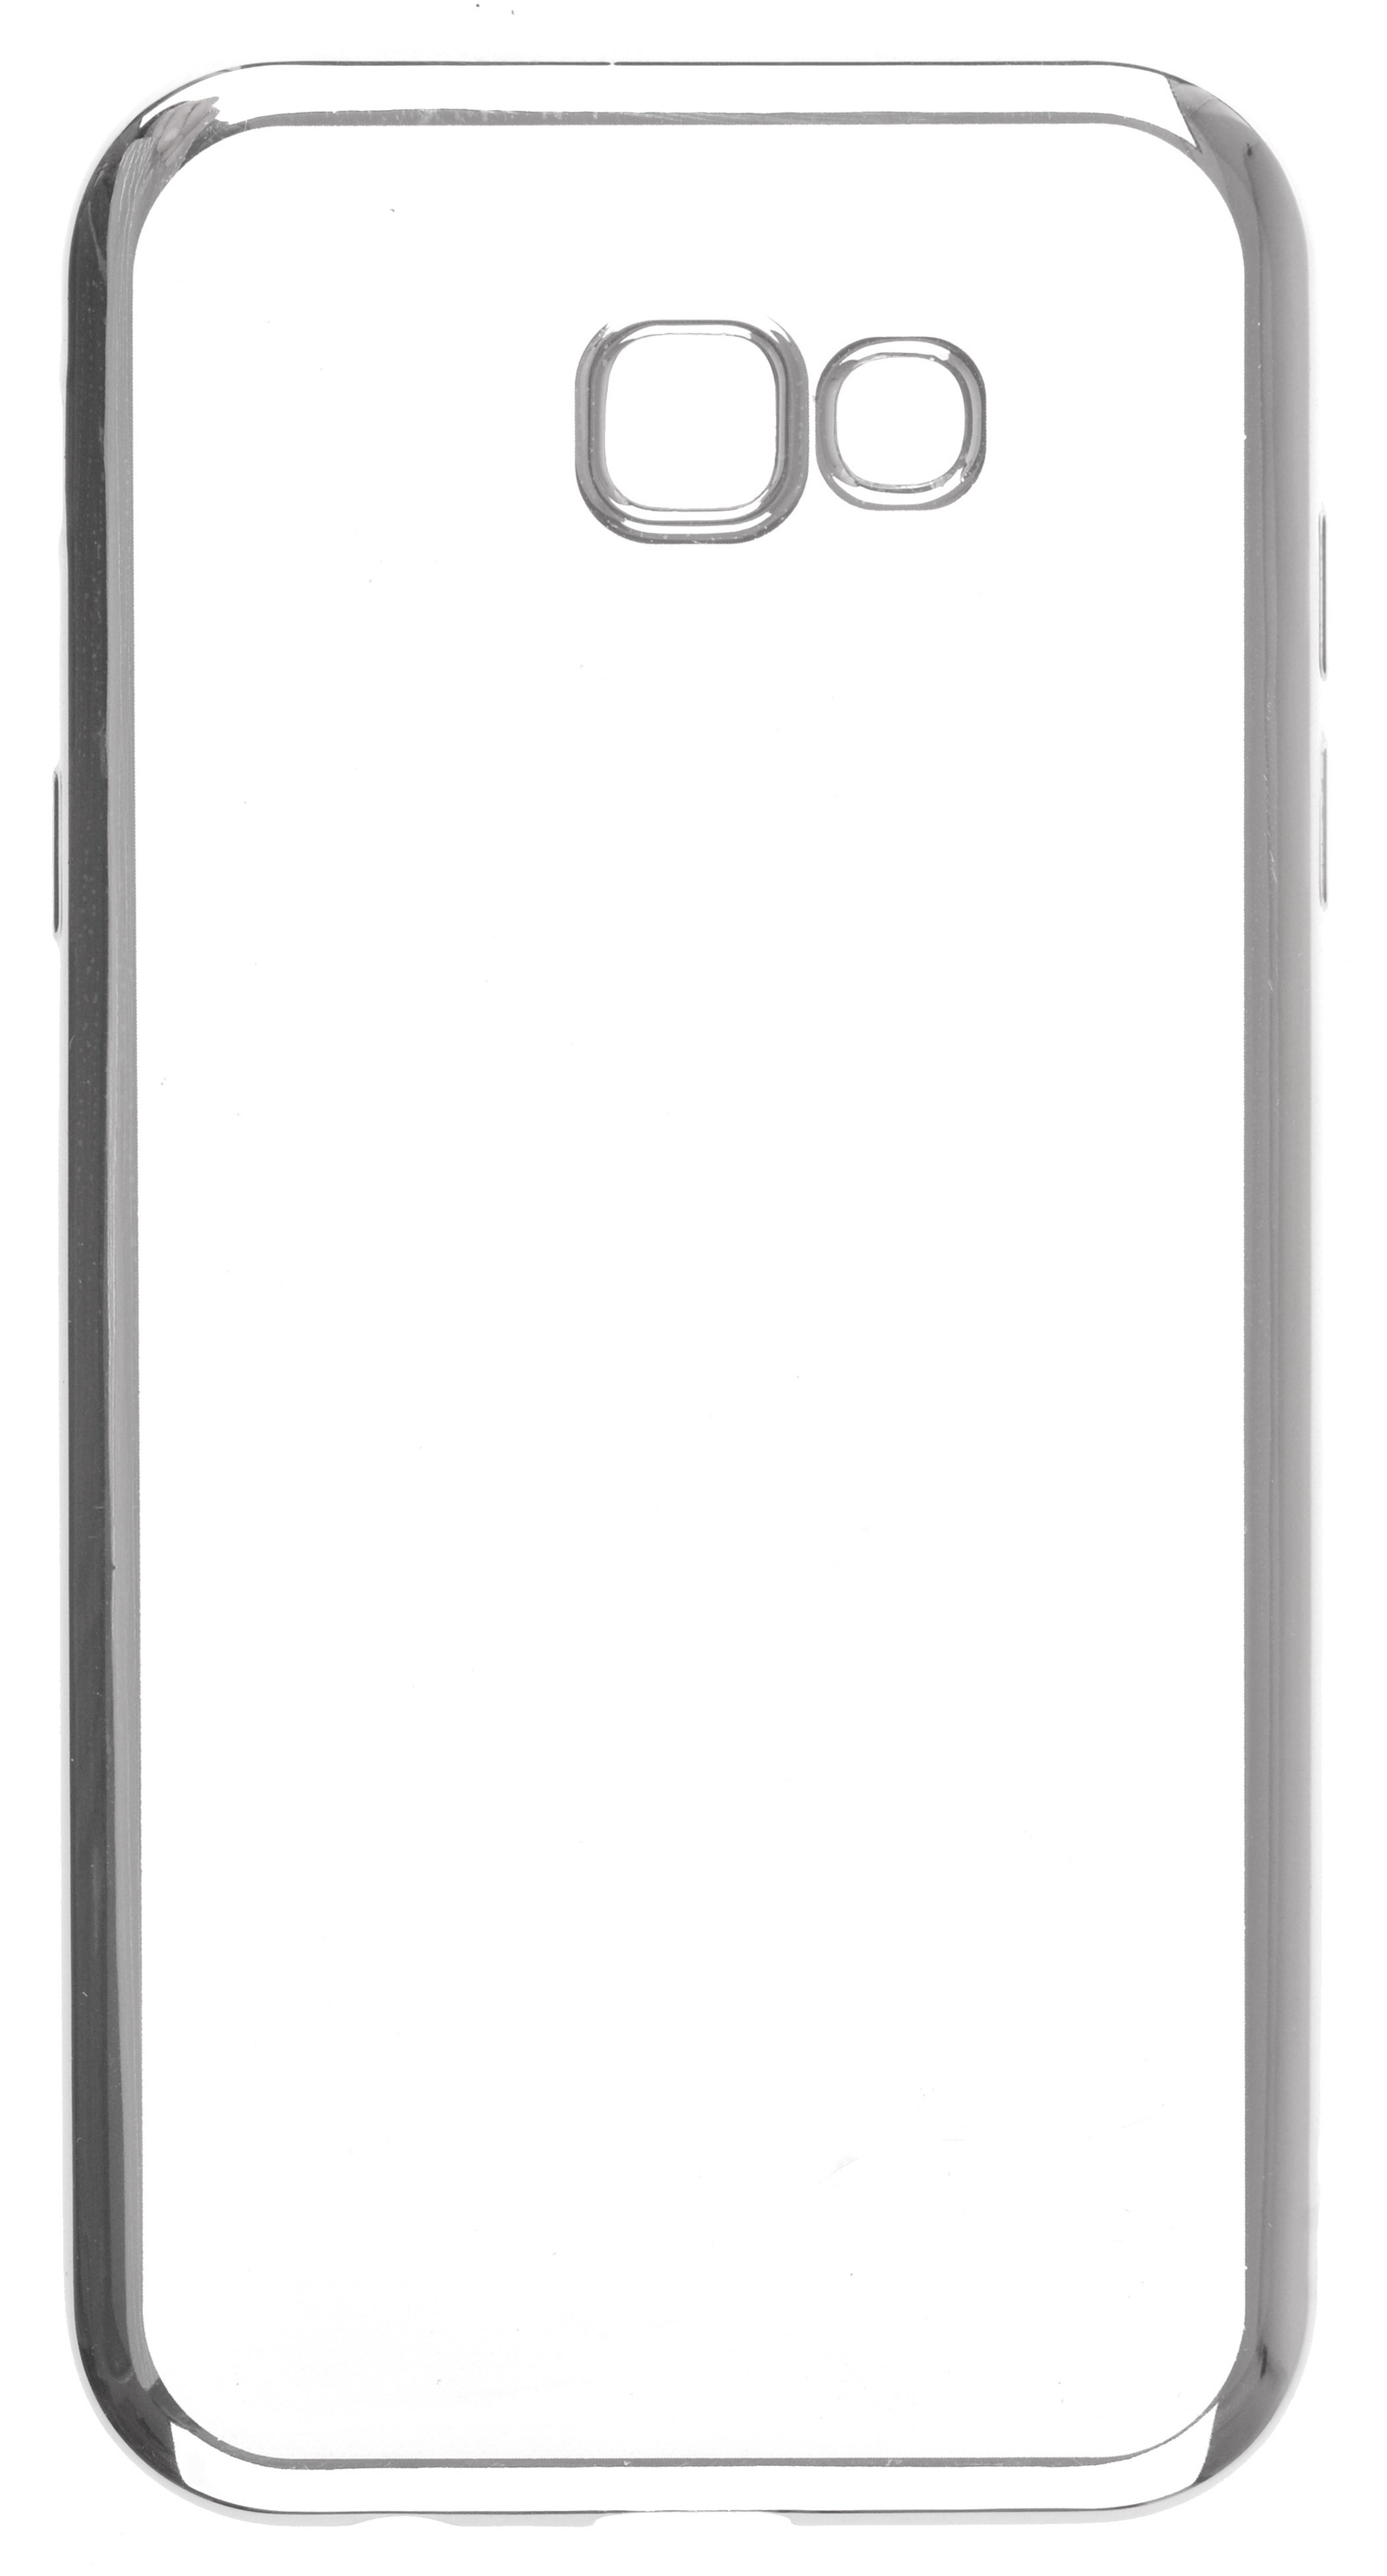 Чехол для сотового телефона skinBOX Silicone chrome border, 4630042524552, серебристый чехол для сотового телефона skinbox silicone chrome border 4660041407891 серебристый